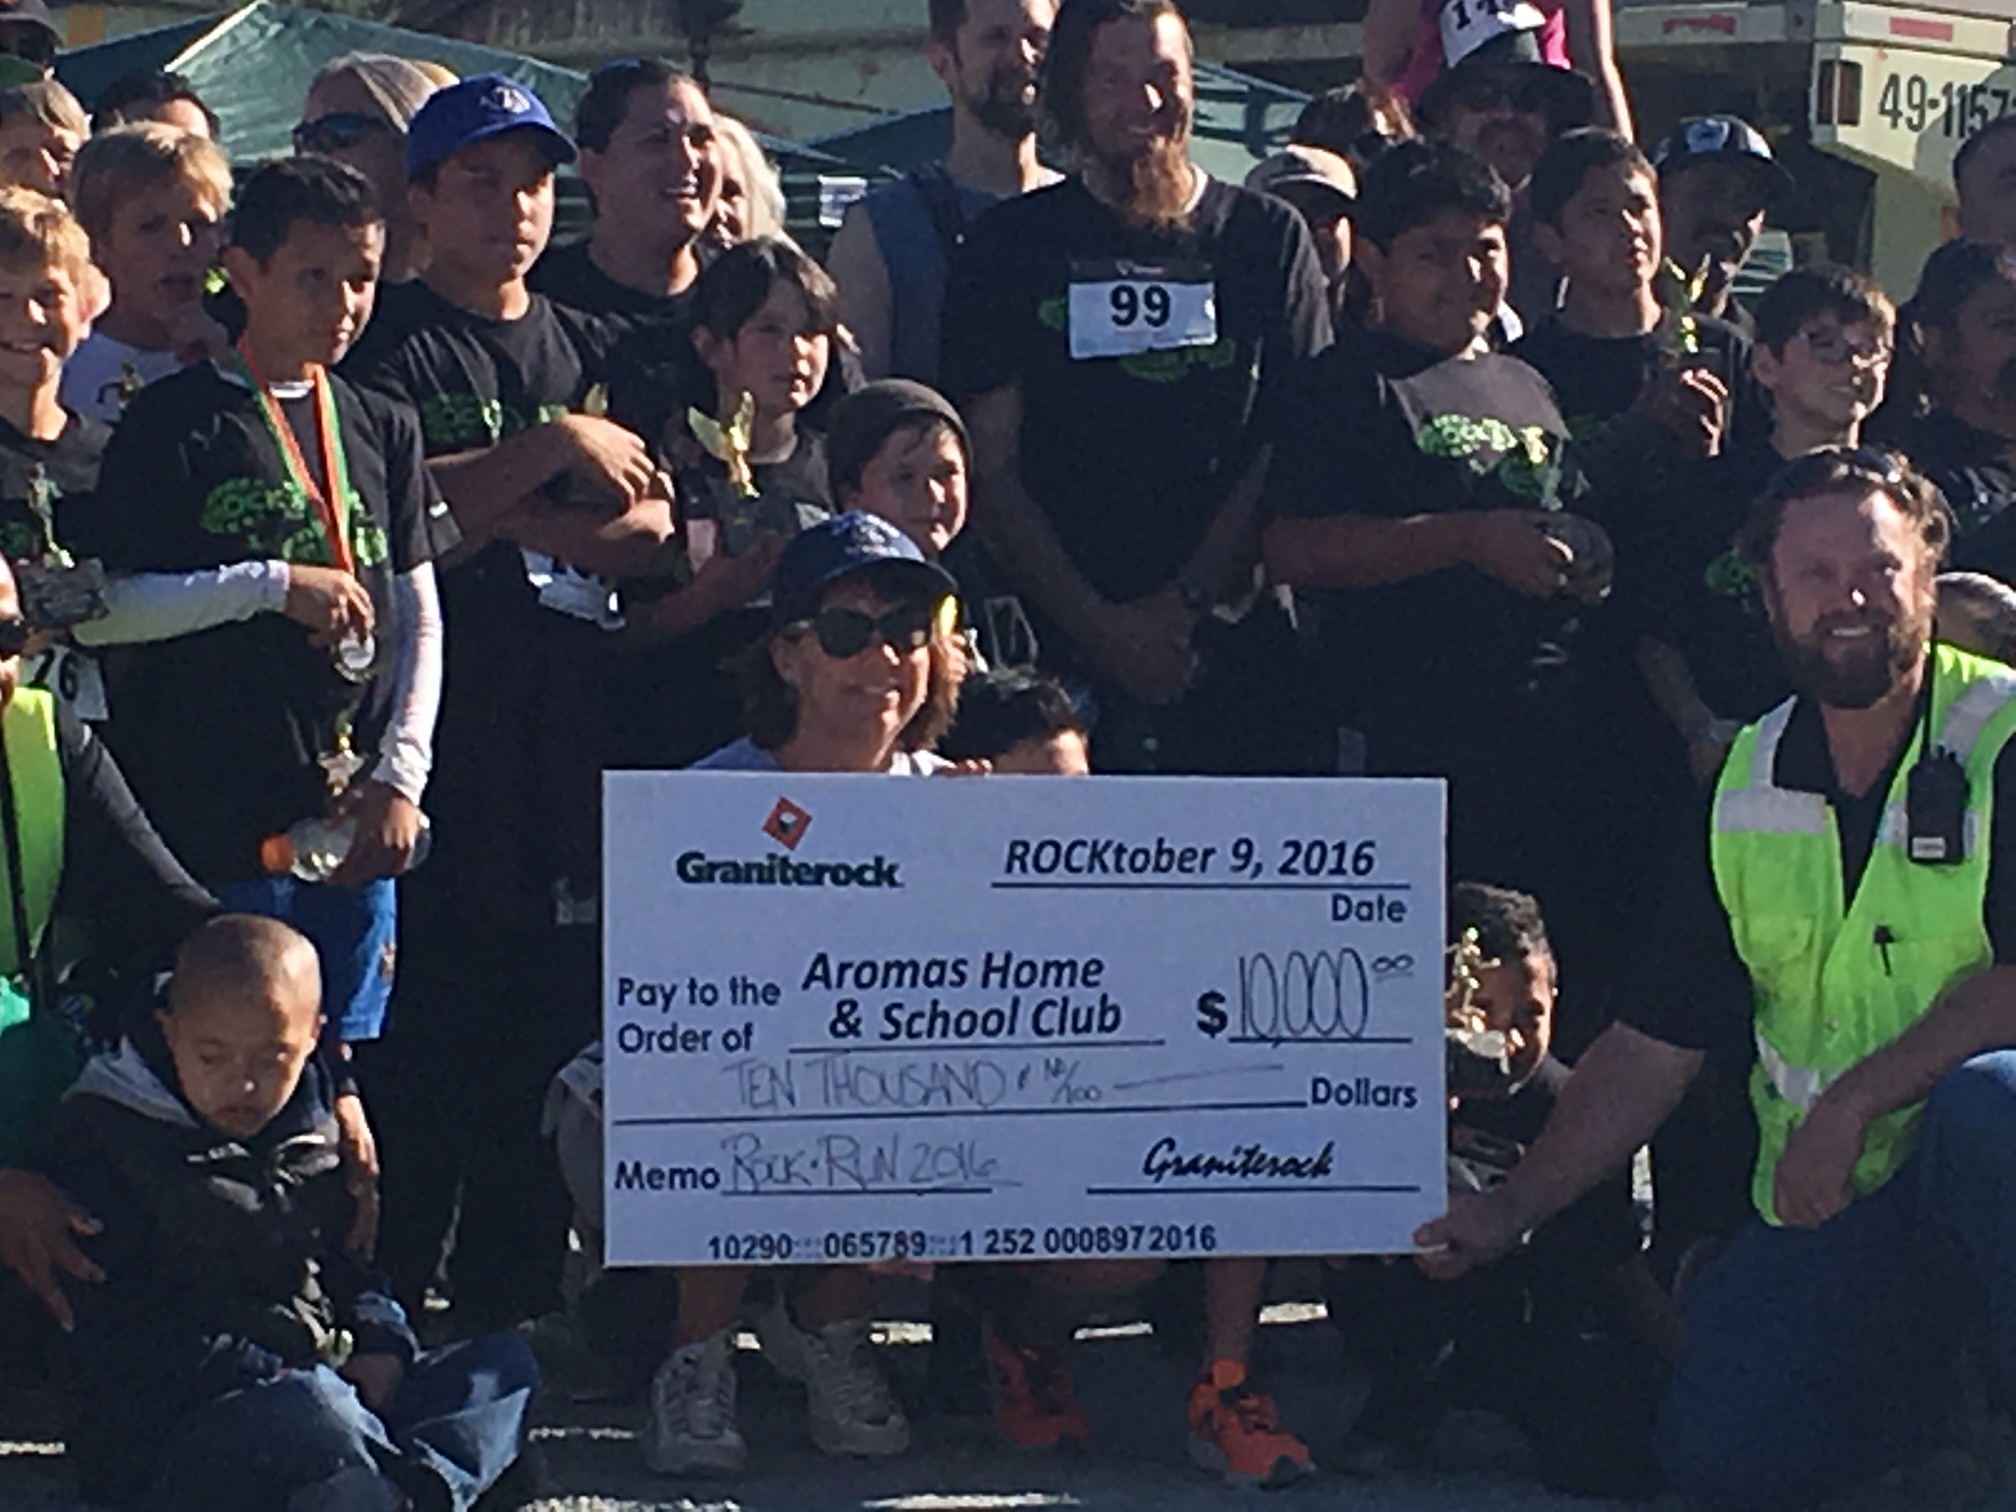 $10,000 for Aromas School